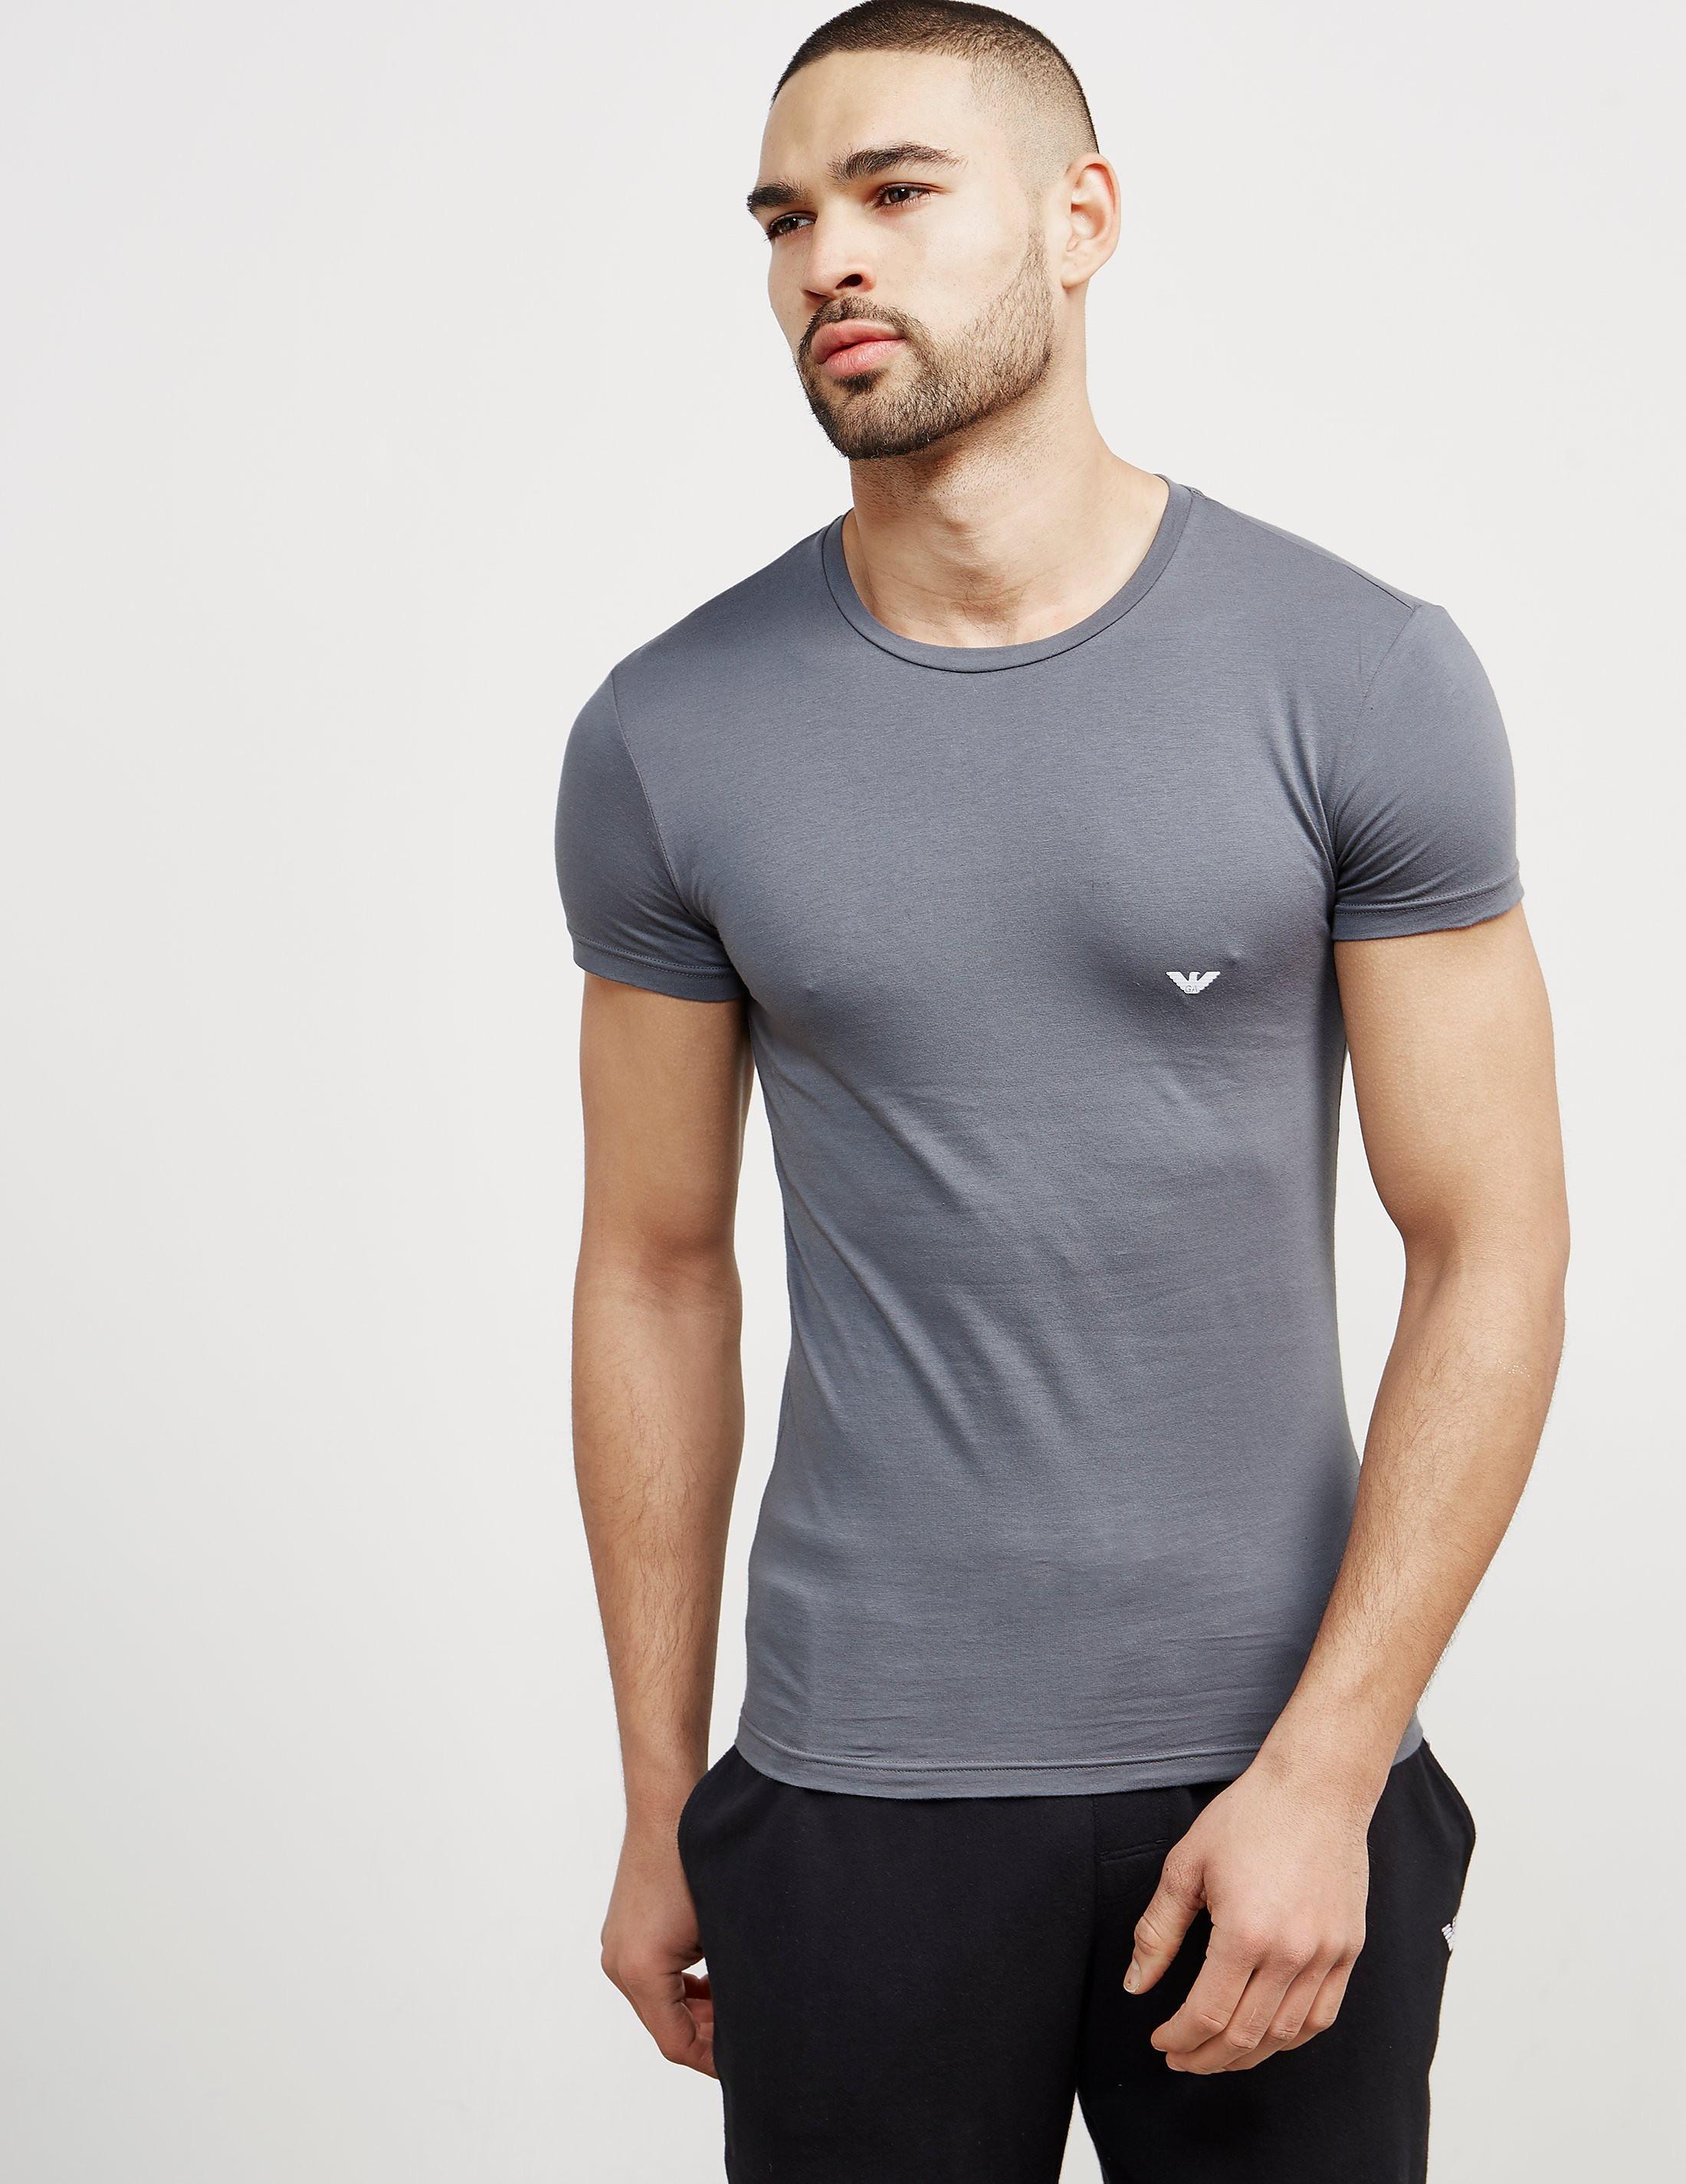 Emporio Armani Crew Short Sleeve T-Shirt